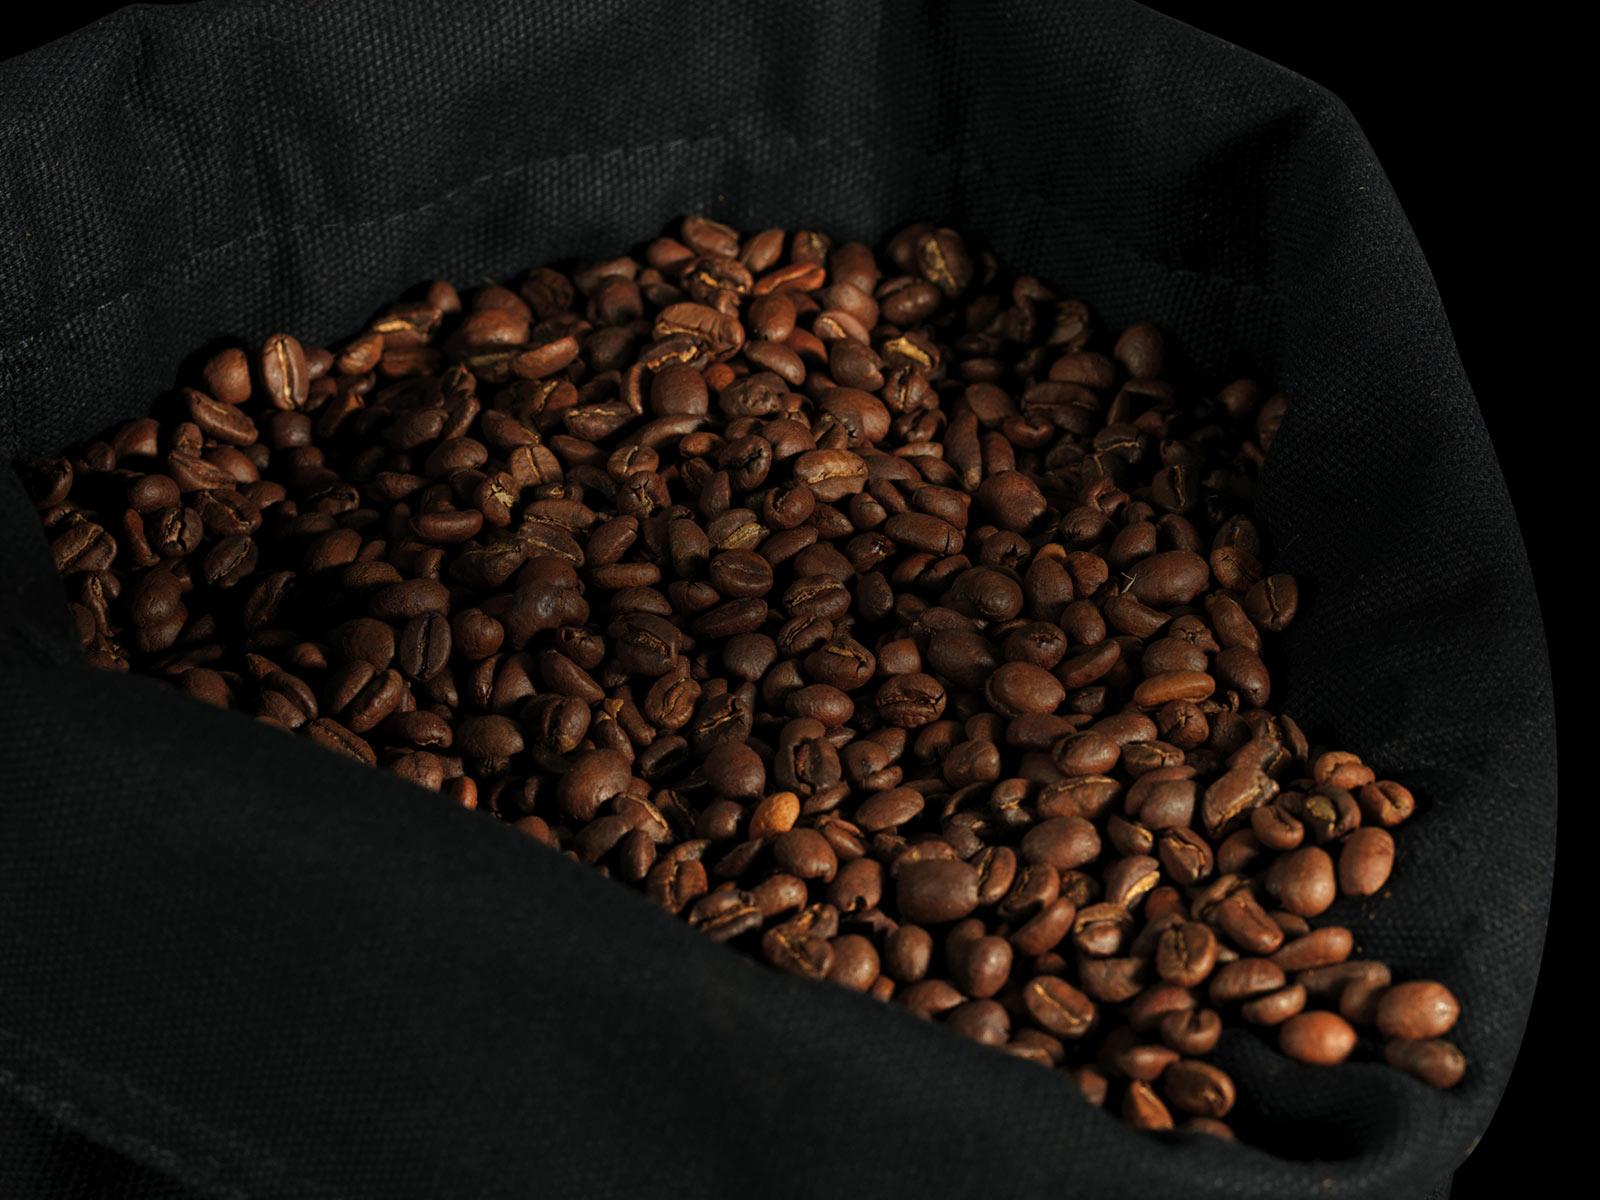 Sac de graines de café Voisin